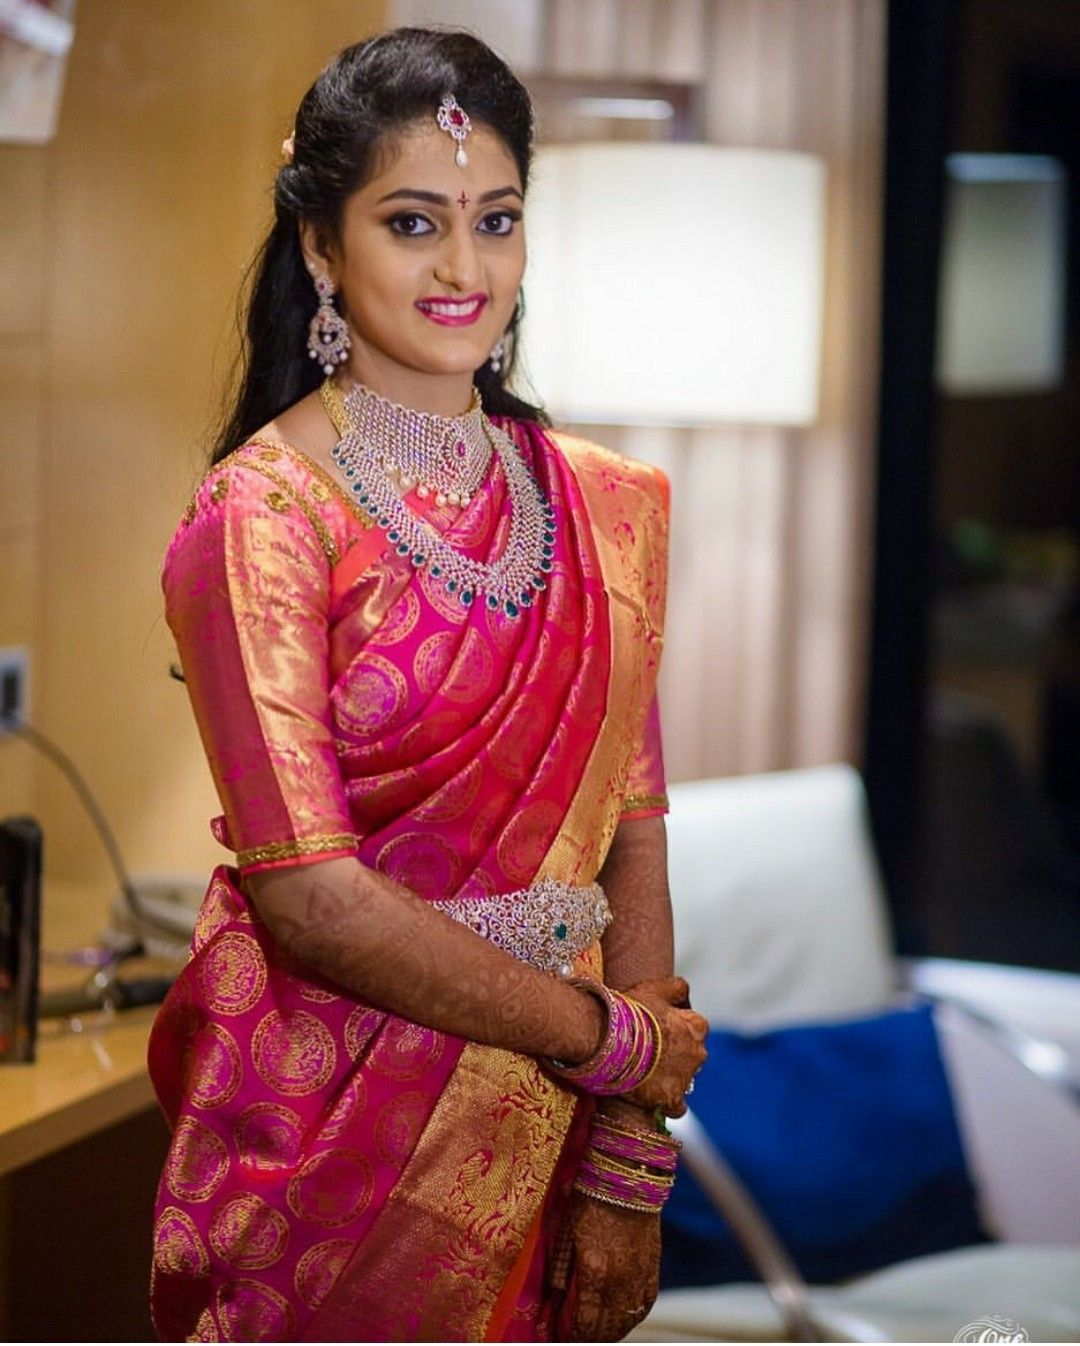 Engagement pattu saree images pin by sripriya on designer blouses  pinterest  saree blouse